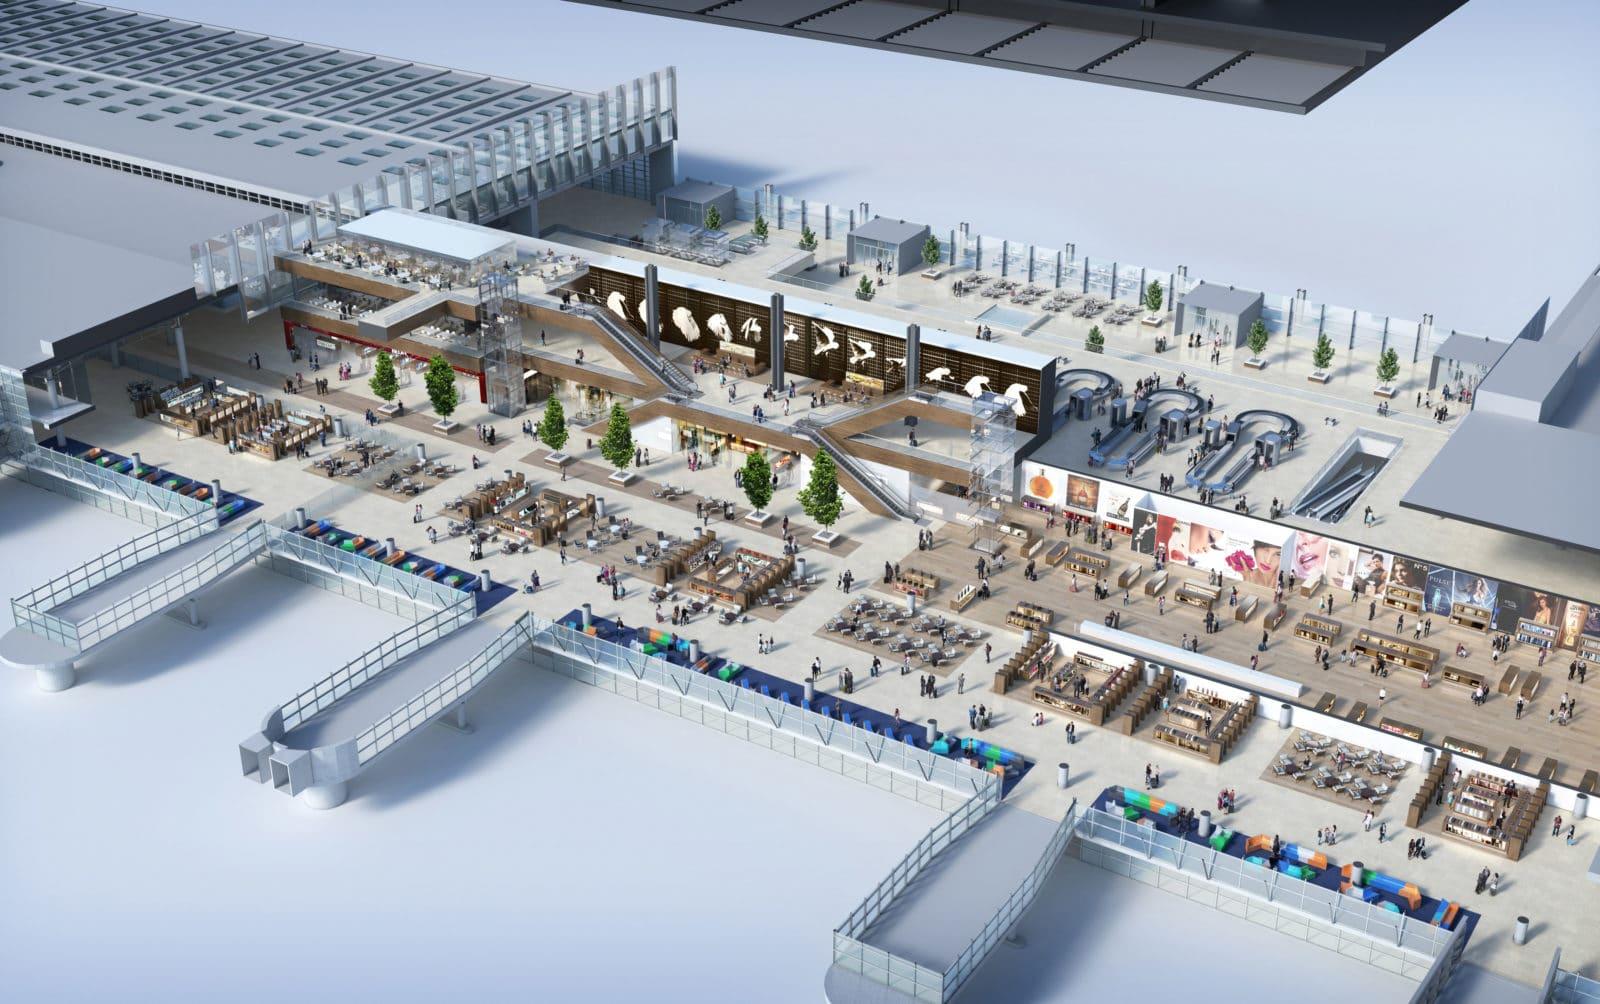 aeroport marseille extension foster 13